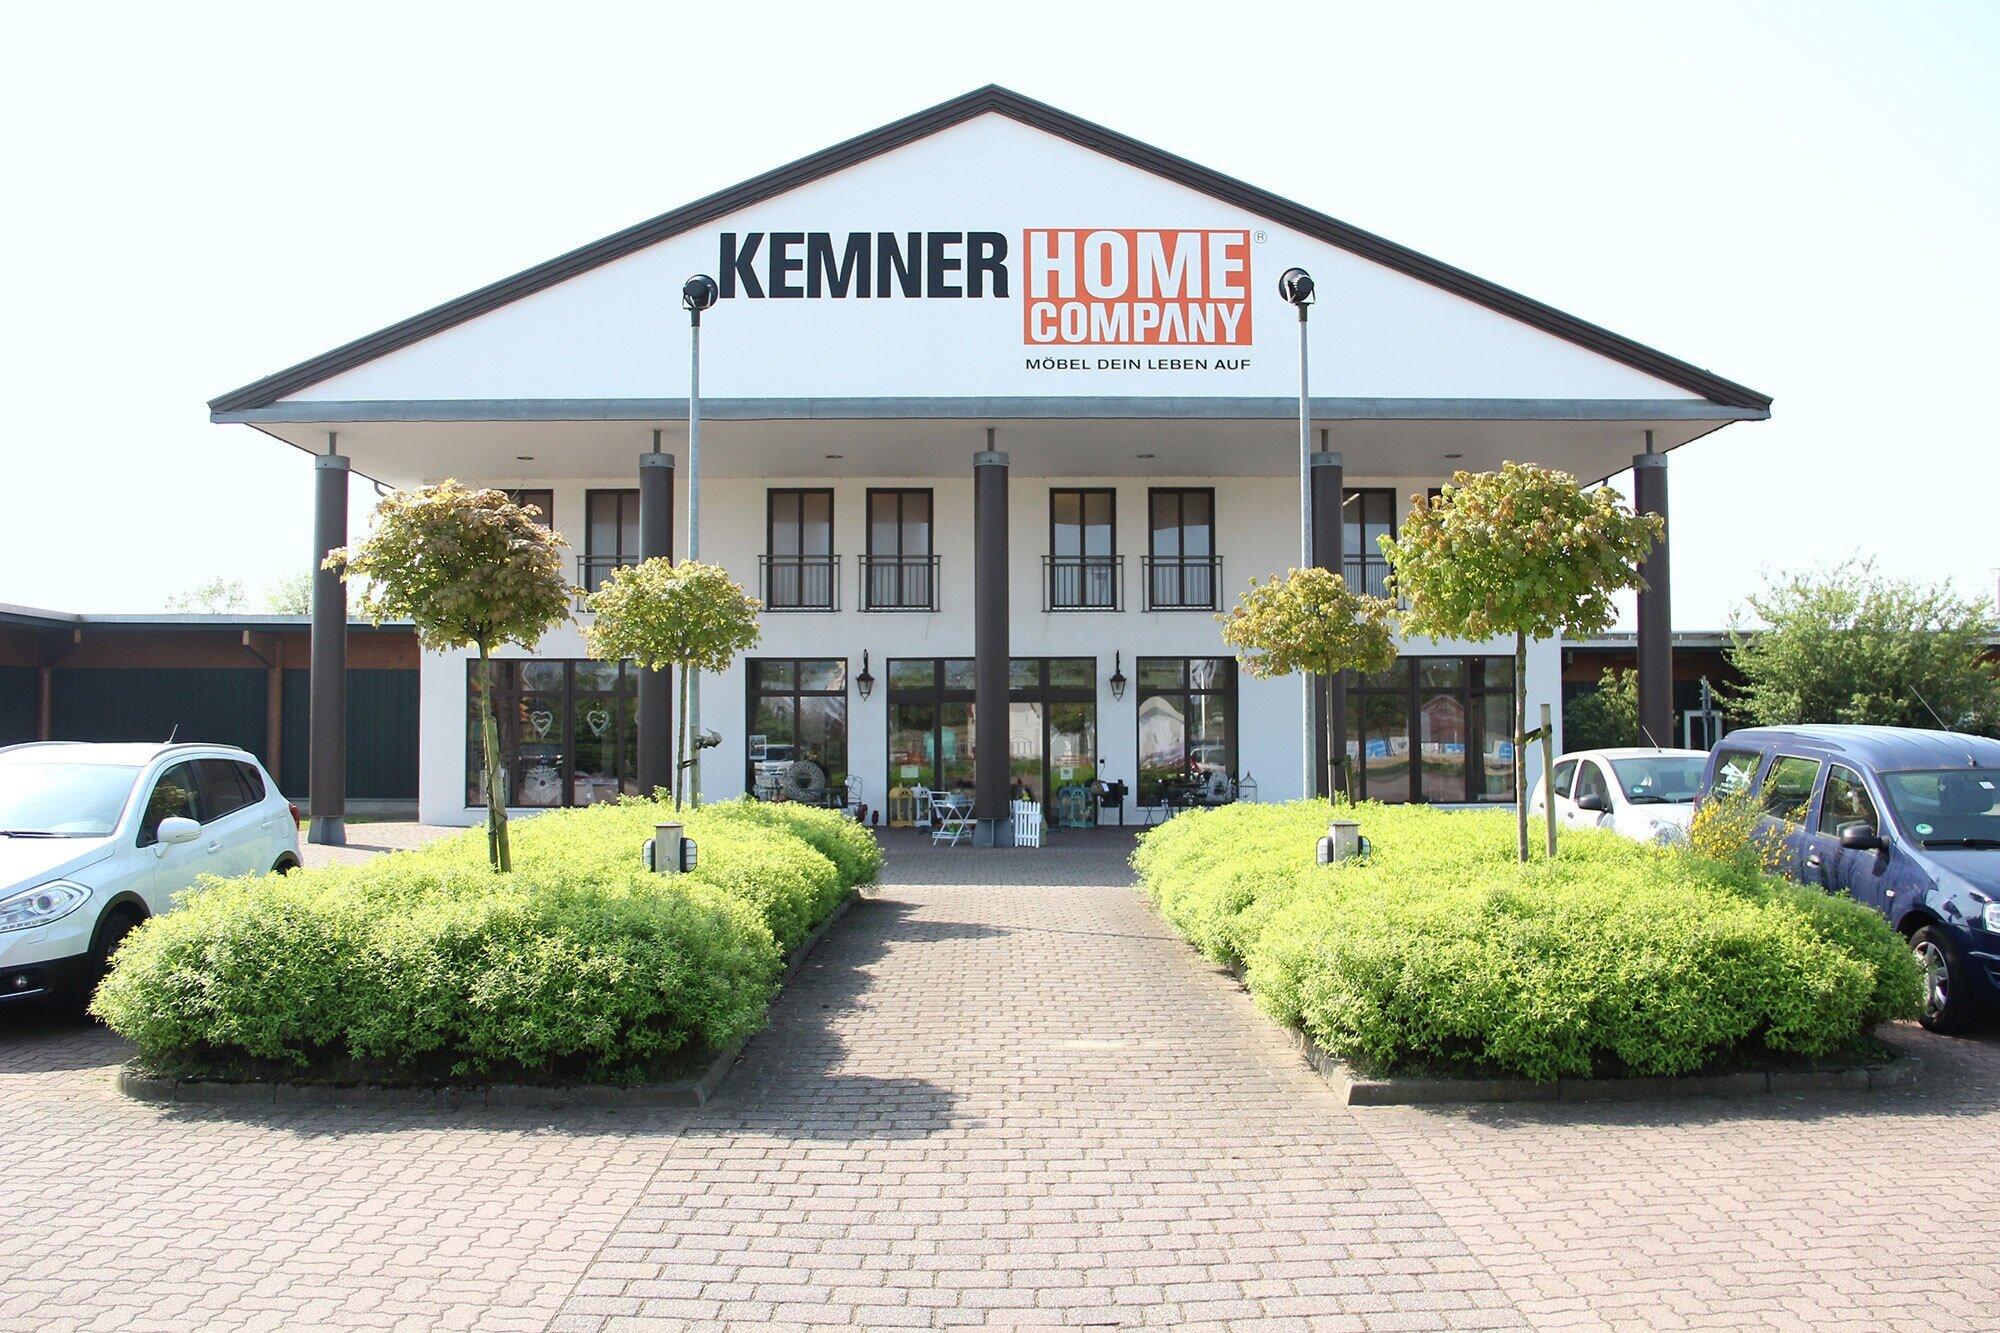 kemner-home-company-bad-bederkesa.jpg